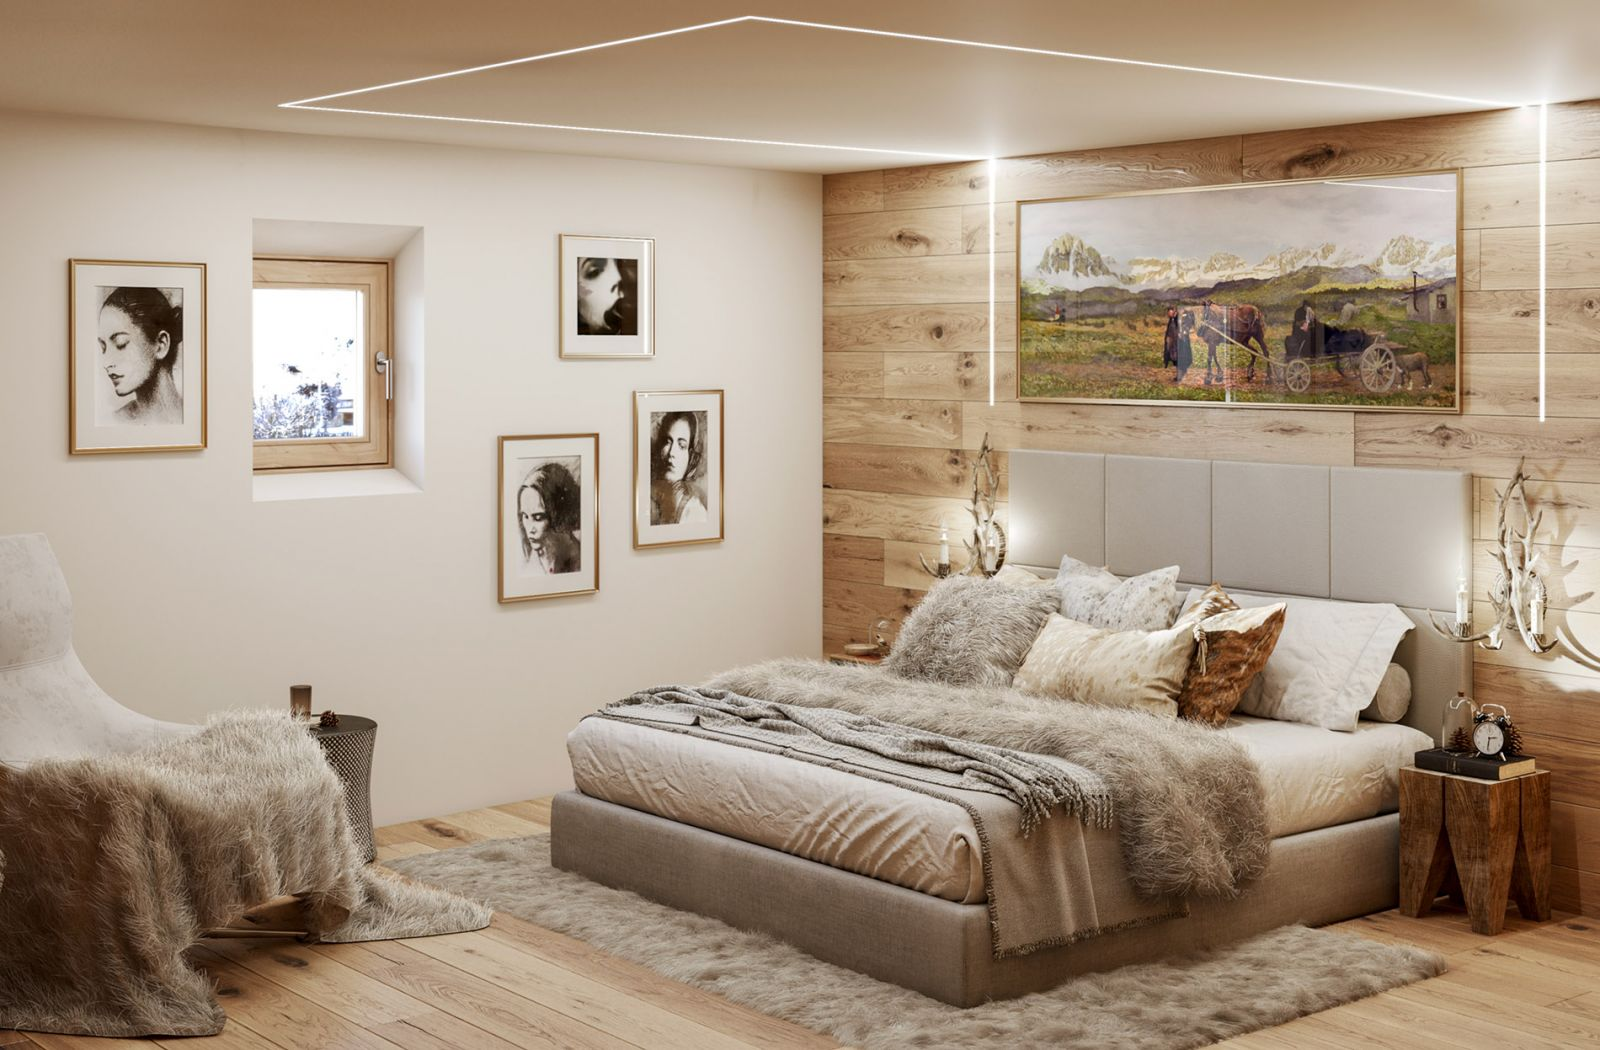 Celerina - Housing 1003